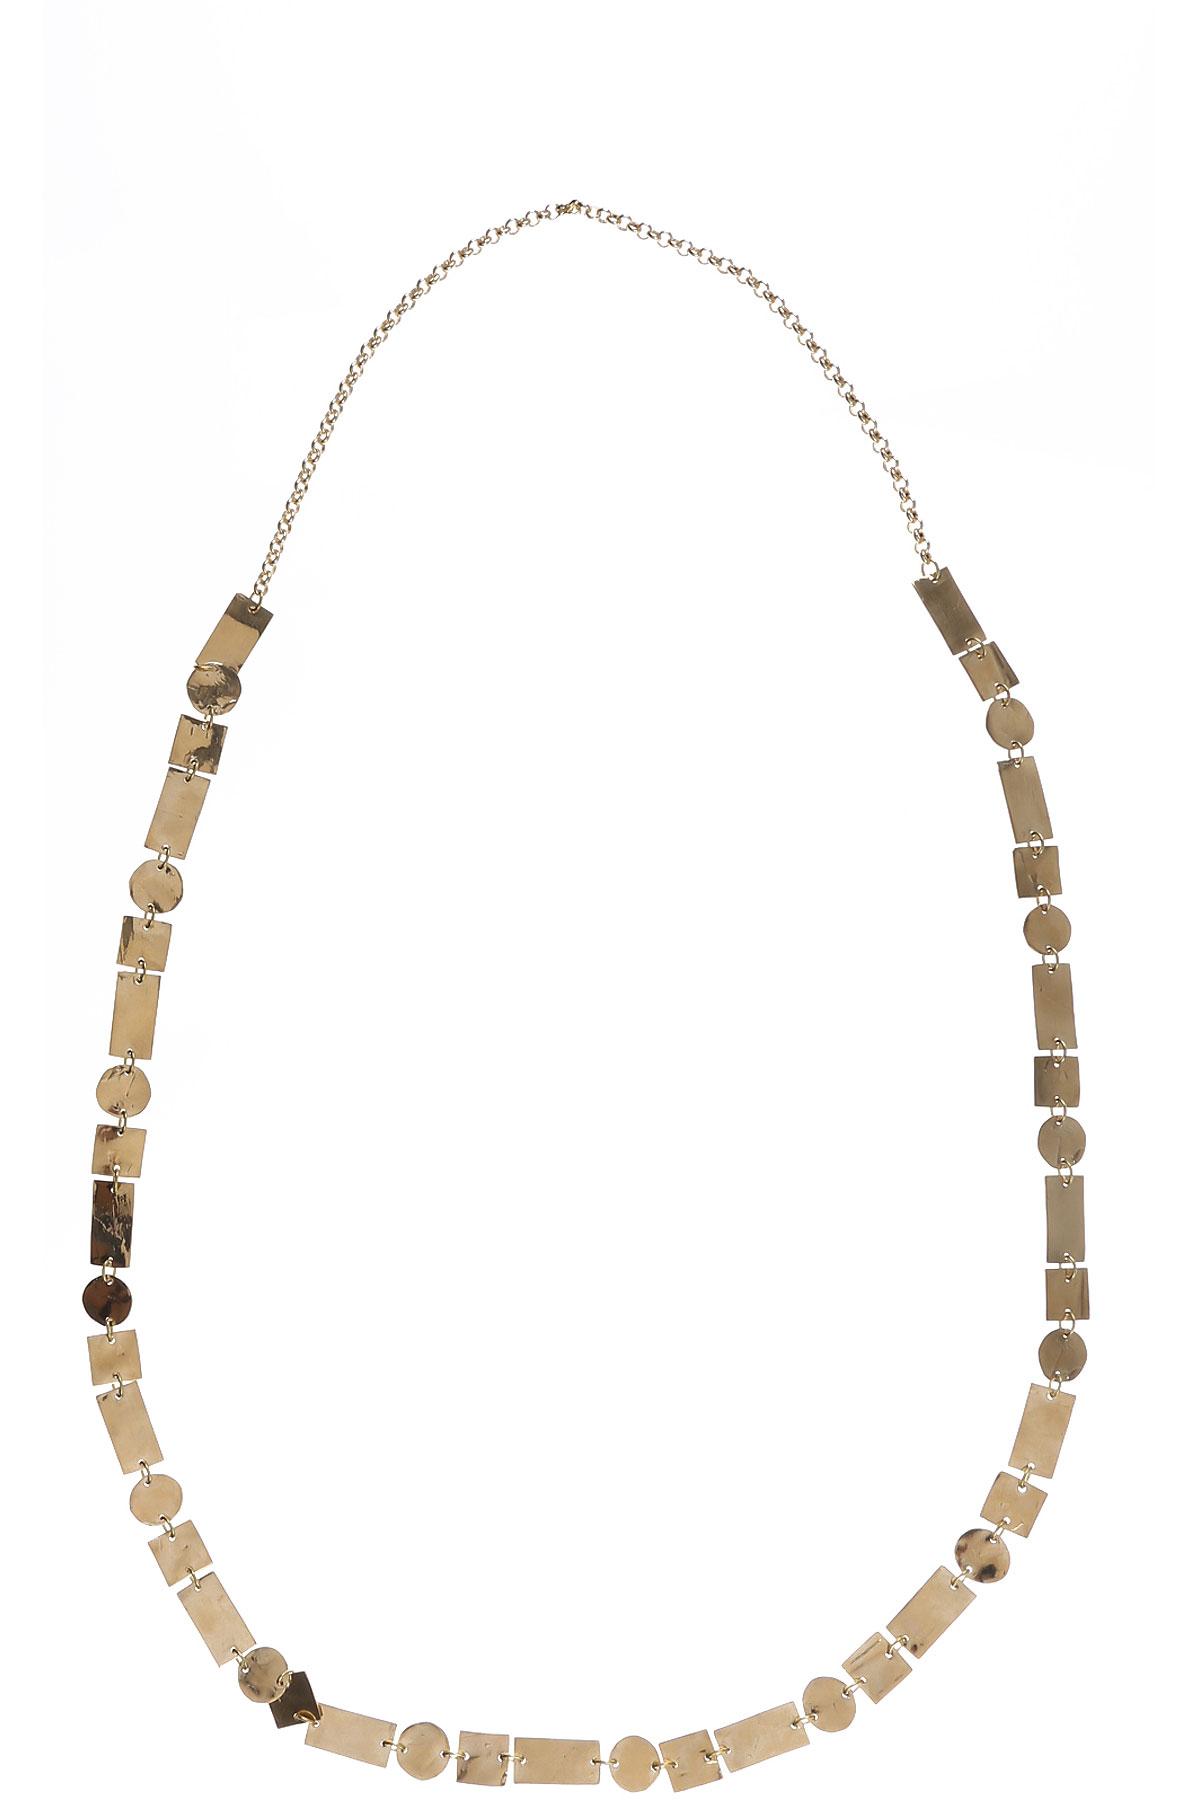 Iron By Miriam Nori Necklaces On Sale, Gold, Bronze, 2019